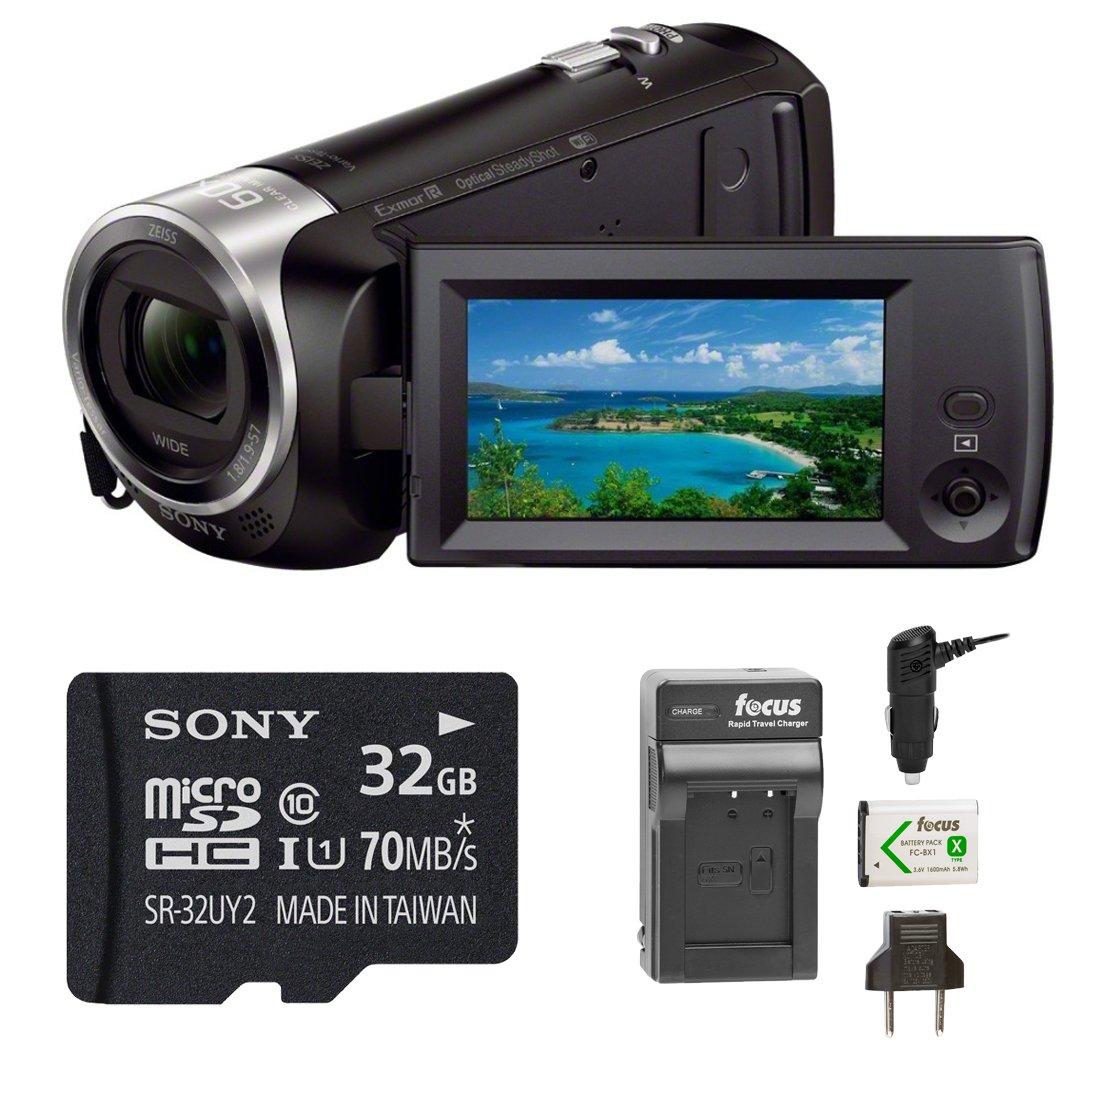 Sony HD Video Recording HDRCX440 Handycam Camcorder (Camcorder w/ Accessory Bundle)